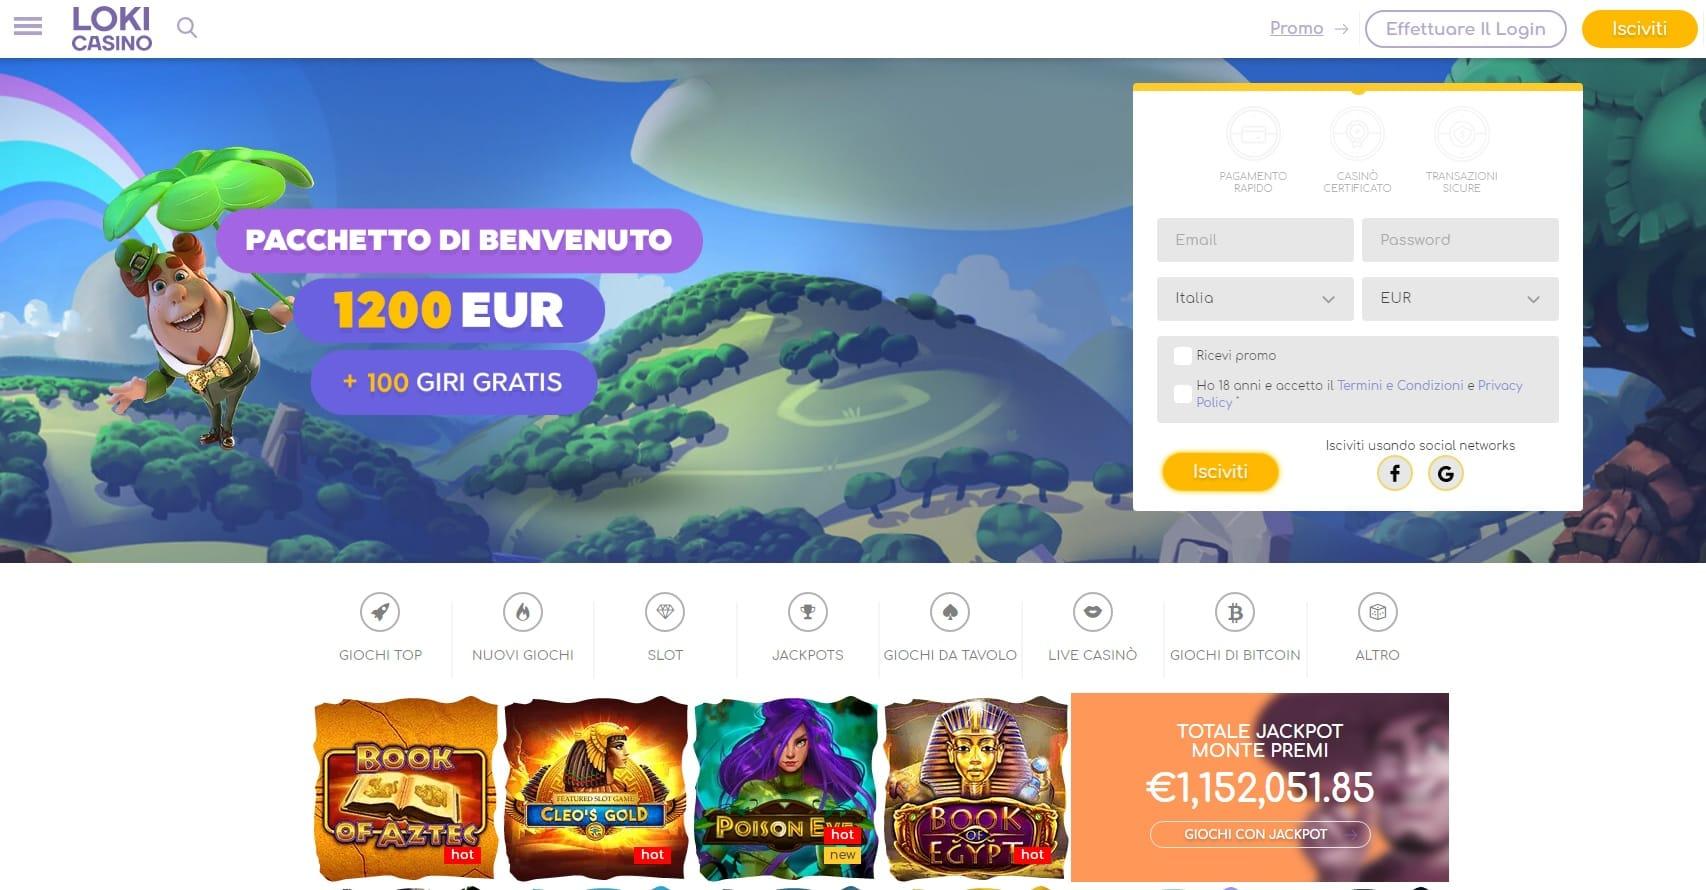 casinò online europei loki casino